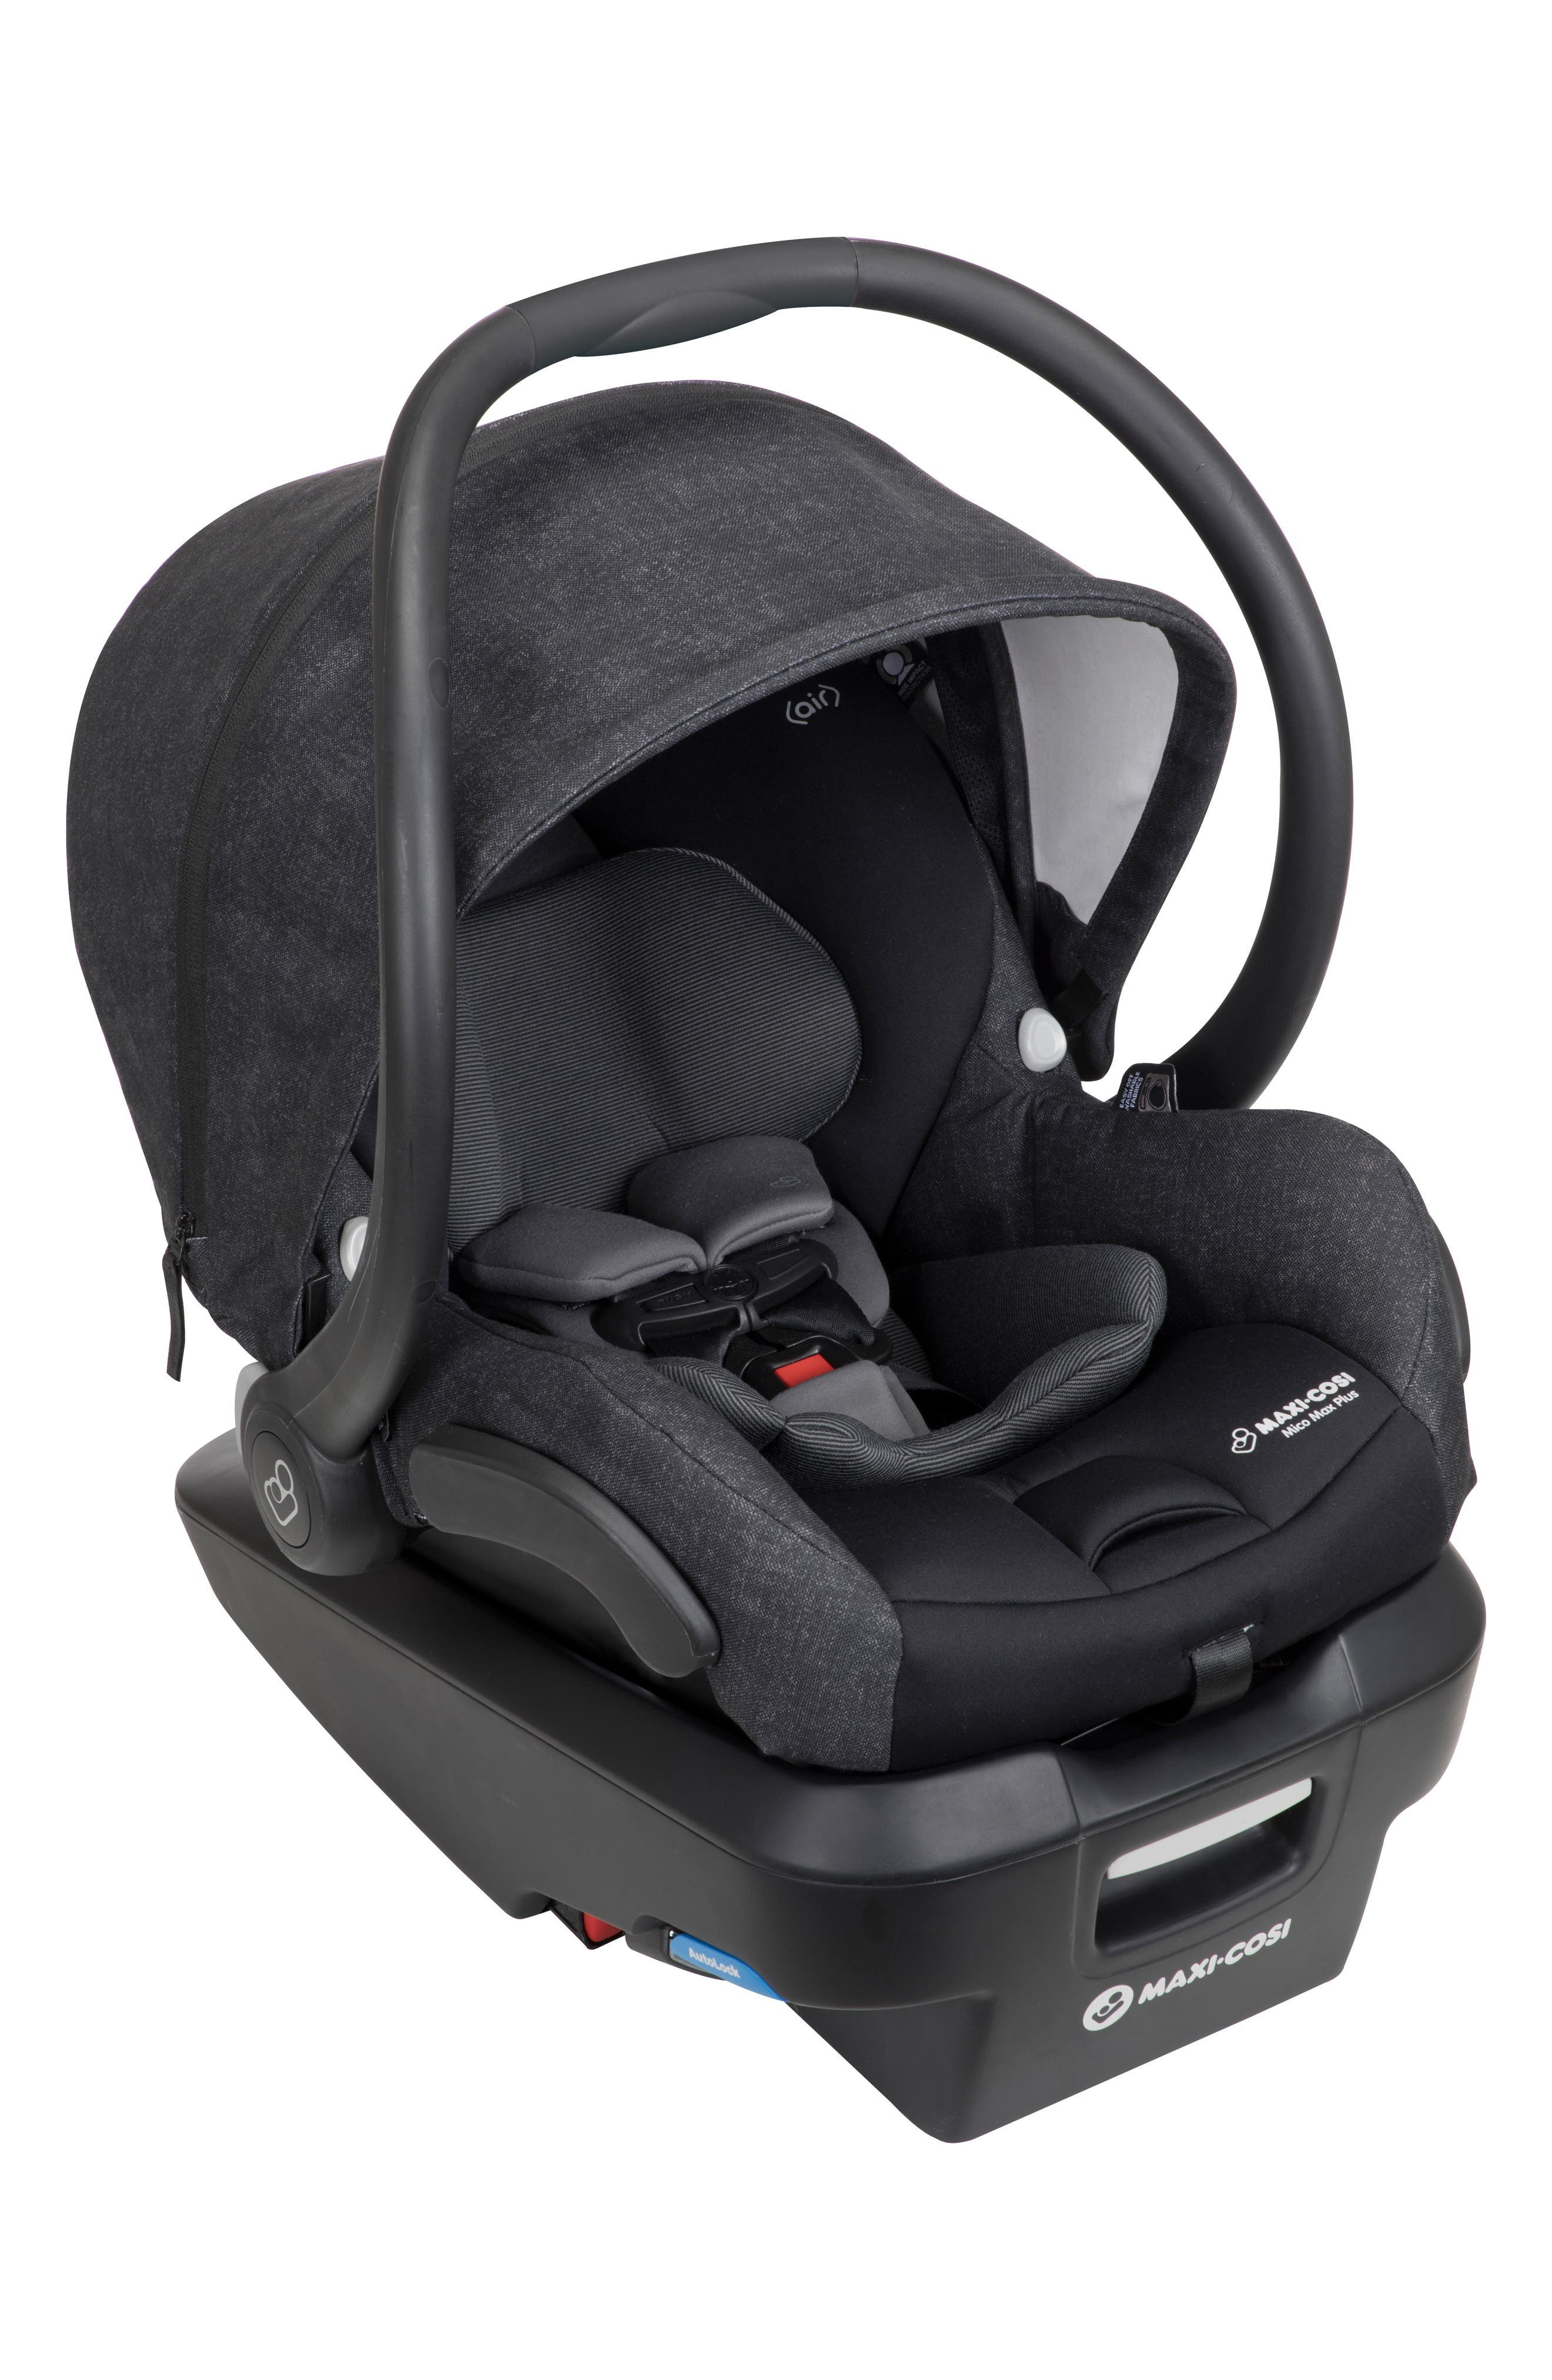 Mico Max Plus Infant Car Seat,                             Alternate thumbnail 9, color,                             NOMAD BLACK